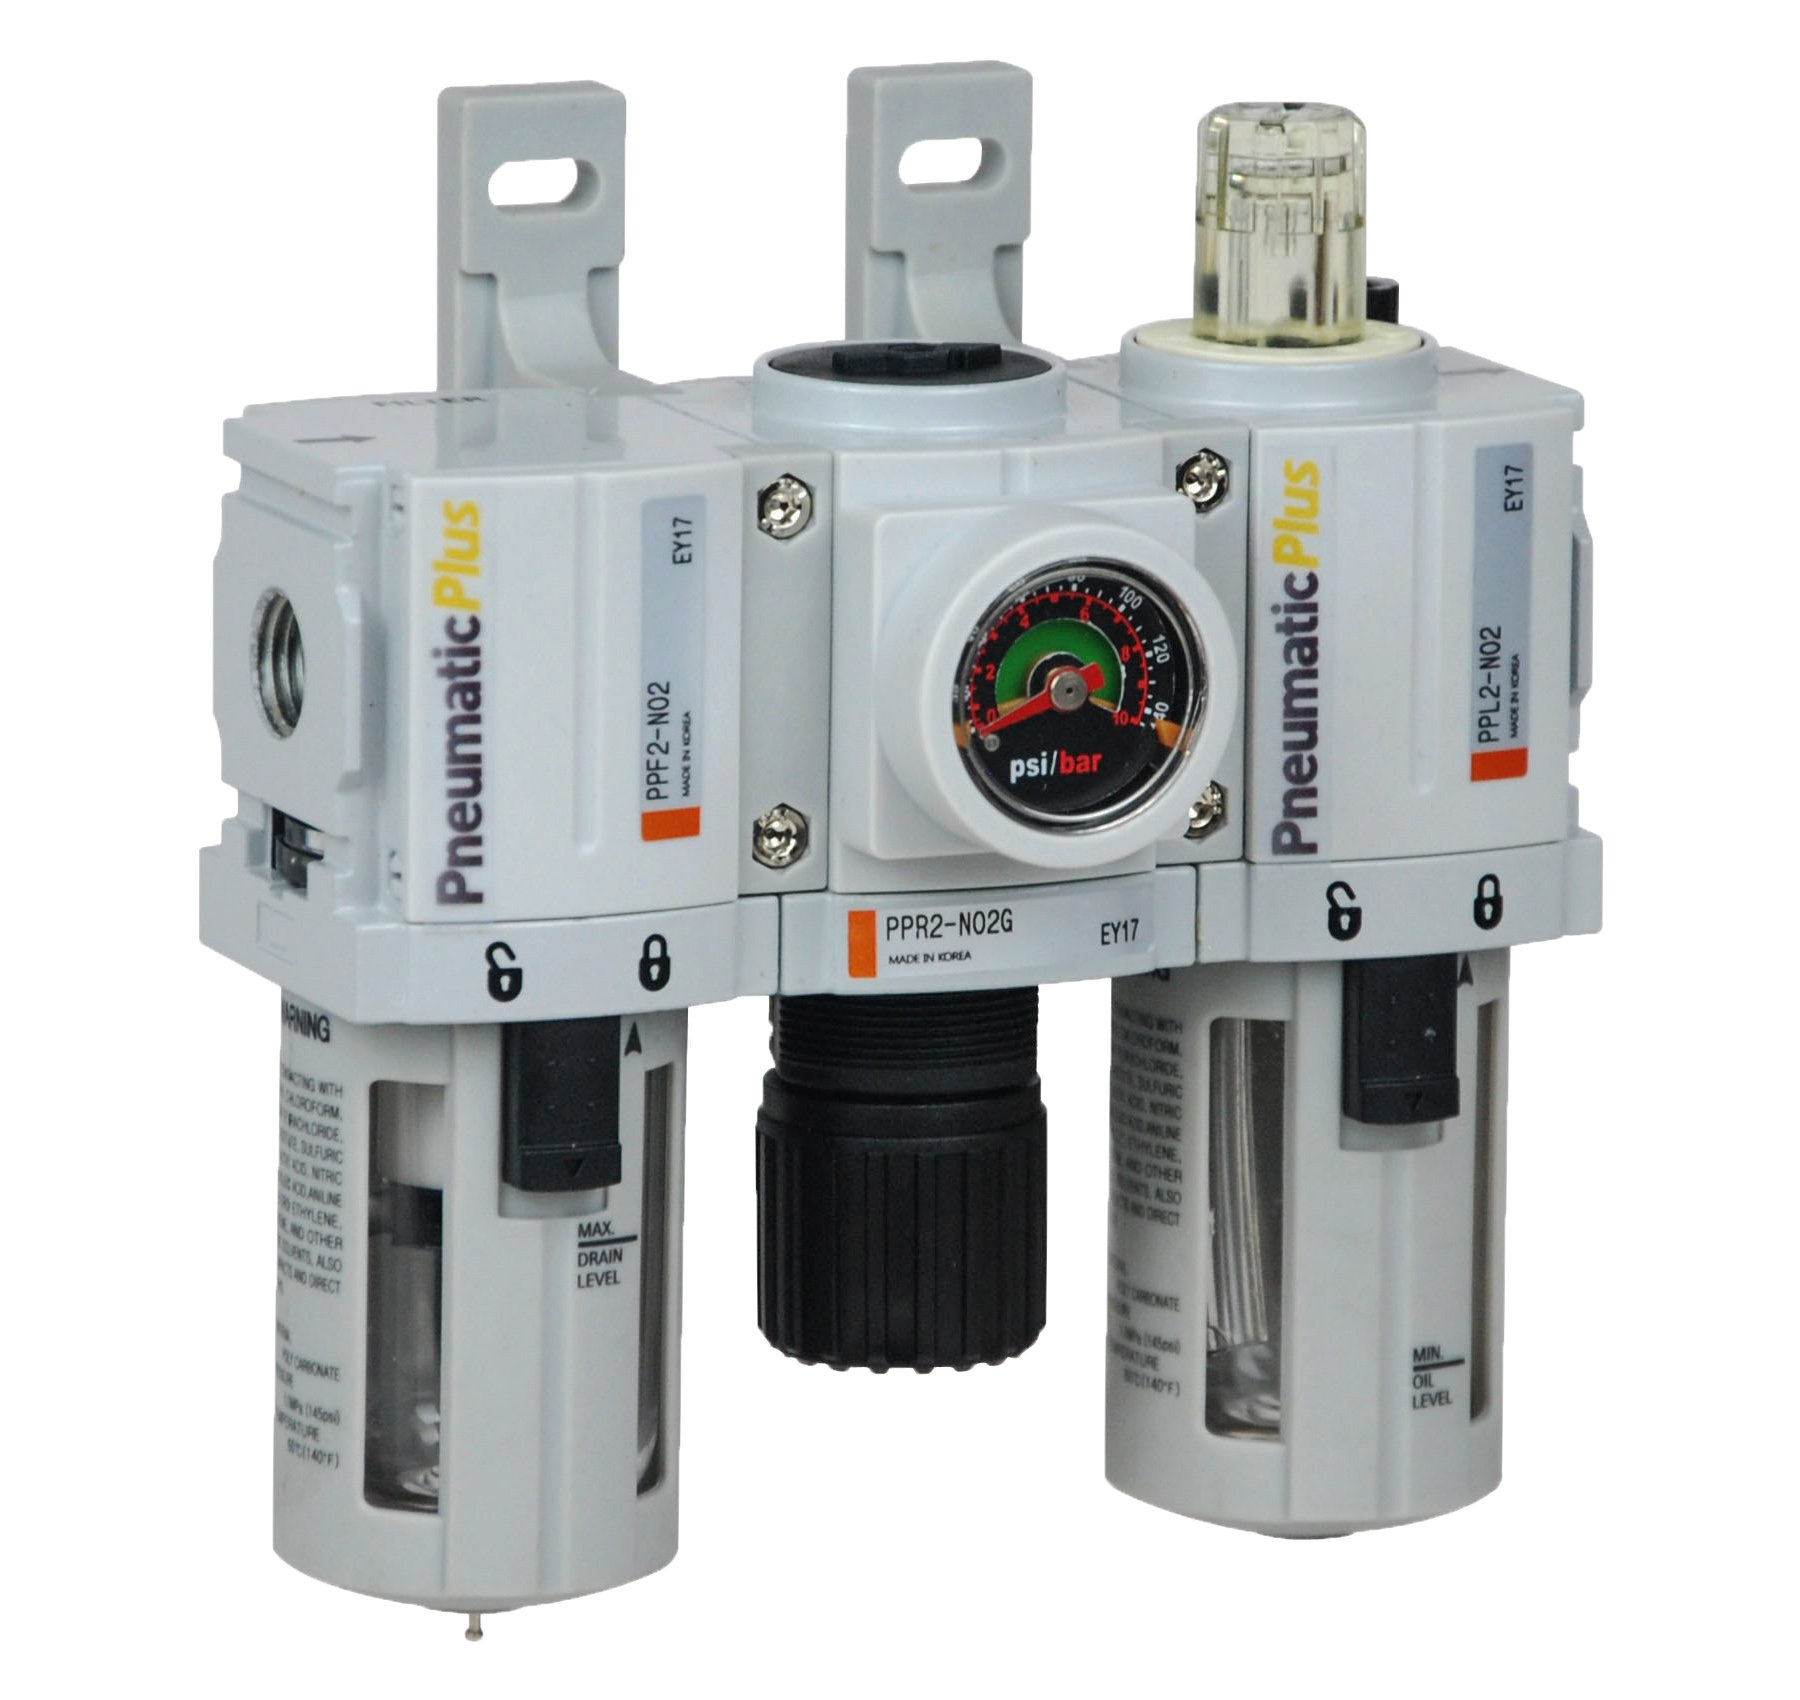 PneumaticPlus PPC2-N02G Mini Compressed Air Filter Regulator Lubricator Combo 1/4'' NPT - Poly Bowl, Manual Drain, Embedded Gauge